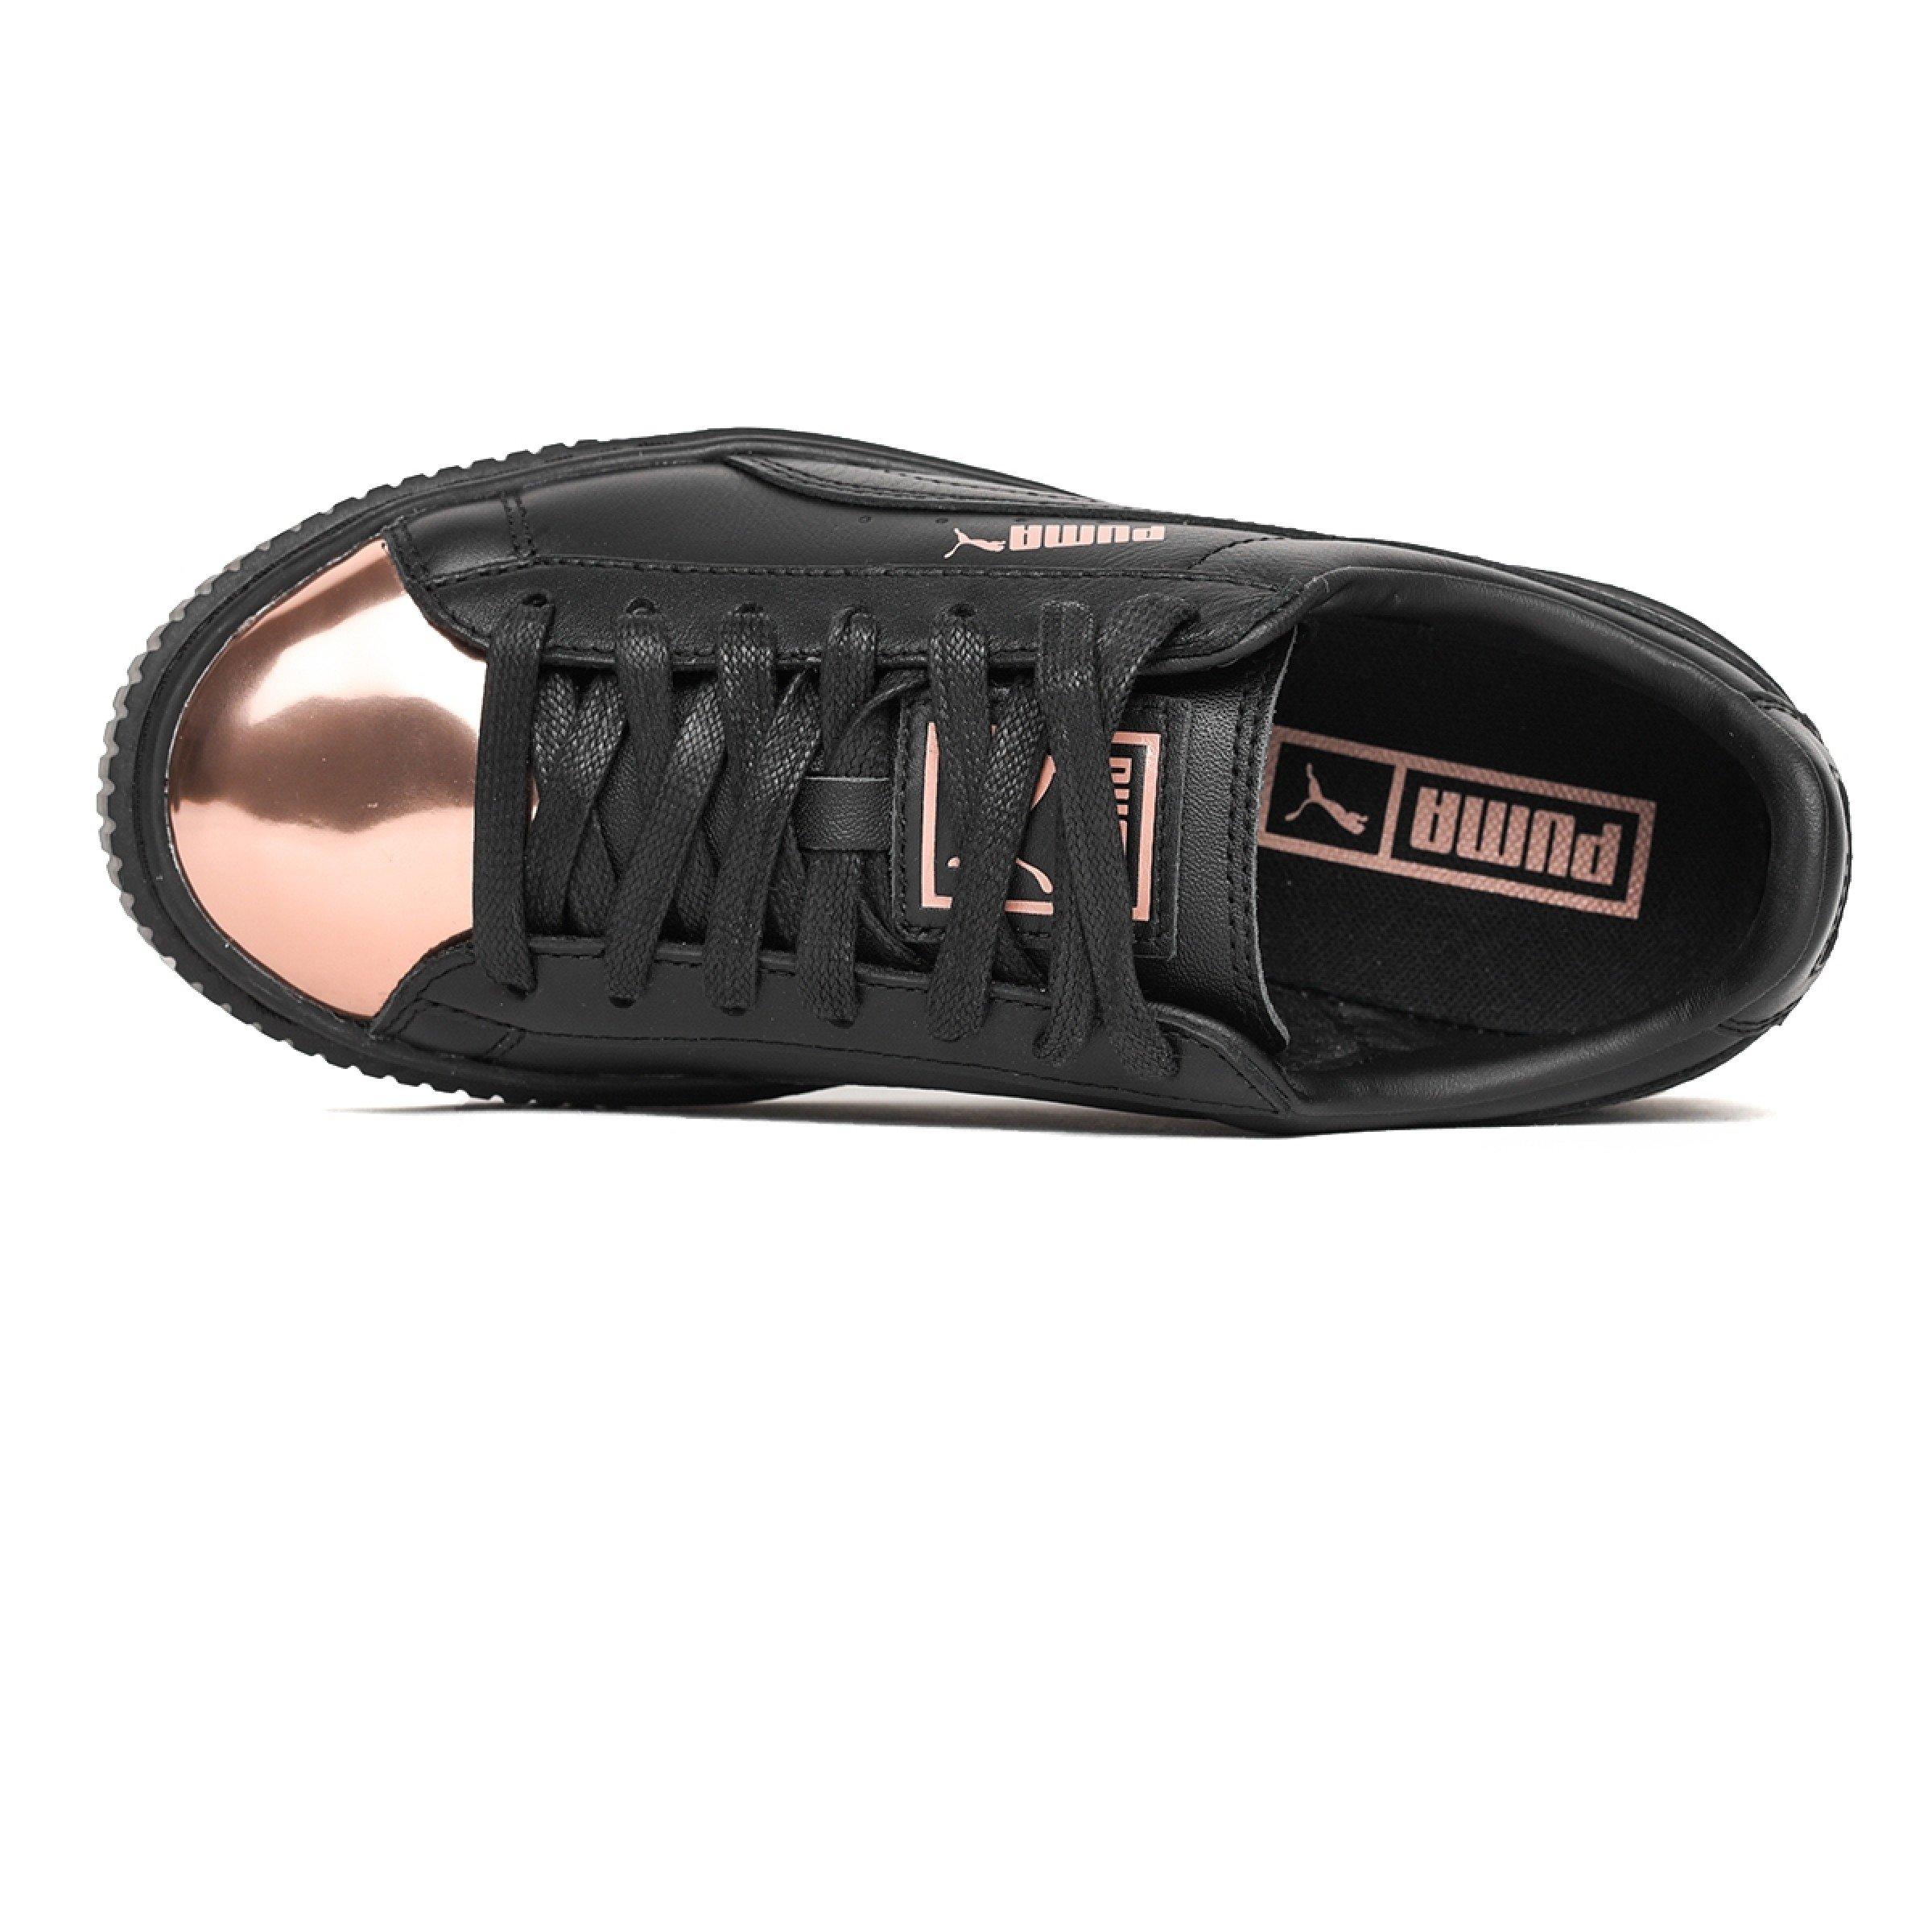 Scarpe PUMA Basket Platform Metallic in pelle nera e punta bronzo 366169 02